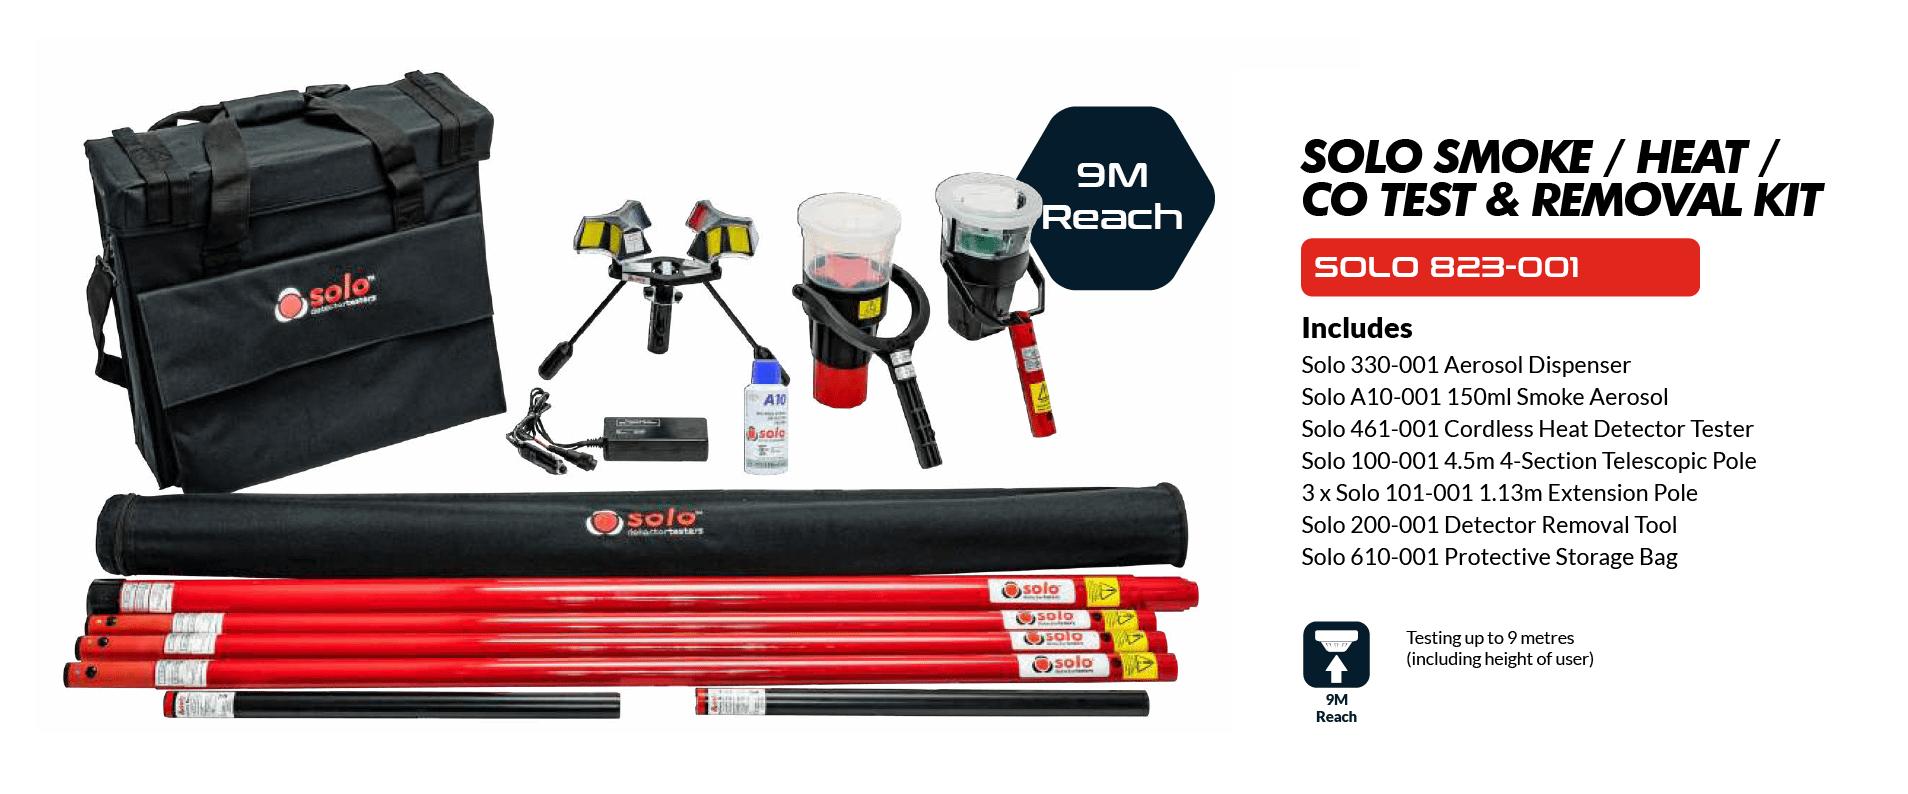 solo-detector-testers-testifire-no-climb-823-smoke-and-heat-detector-test-kit-singapore